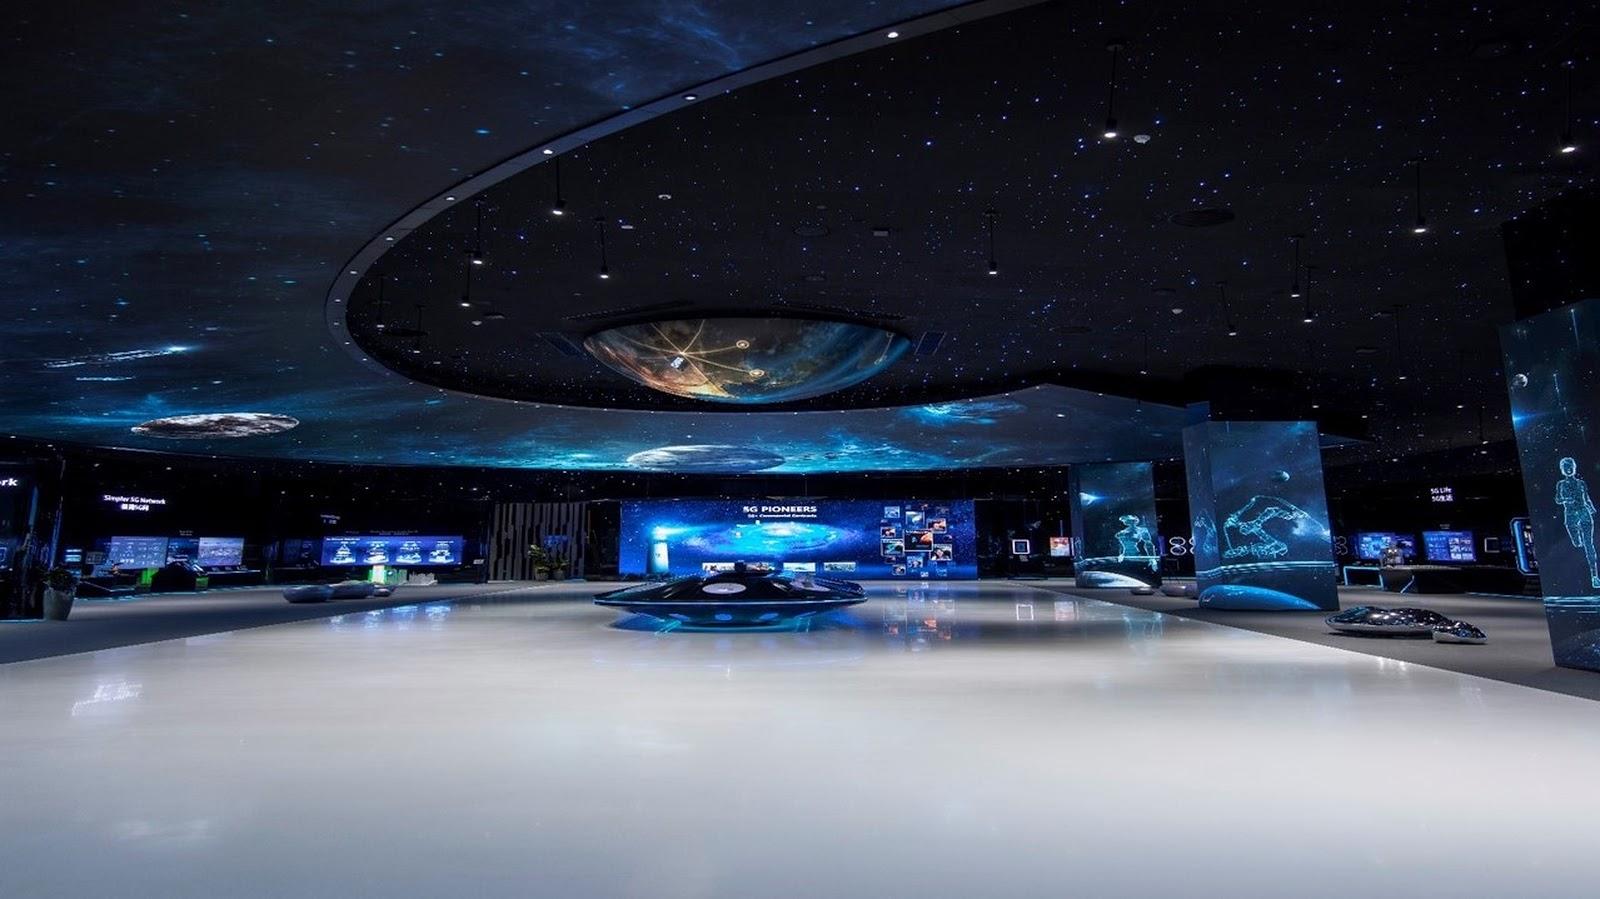 Huawei โชว์เทคโนโลยีชั้นนำจากงาน HUAWEI Galileo 5G Online Live Tour เผยเทรนด์ใหญ่ 5G ระดับโลกที่น่าจับตา